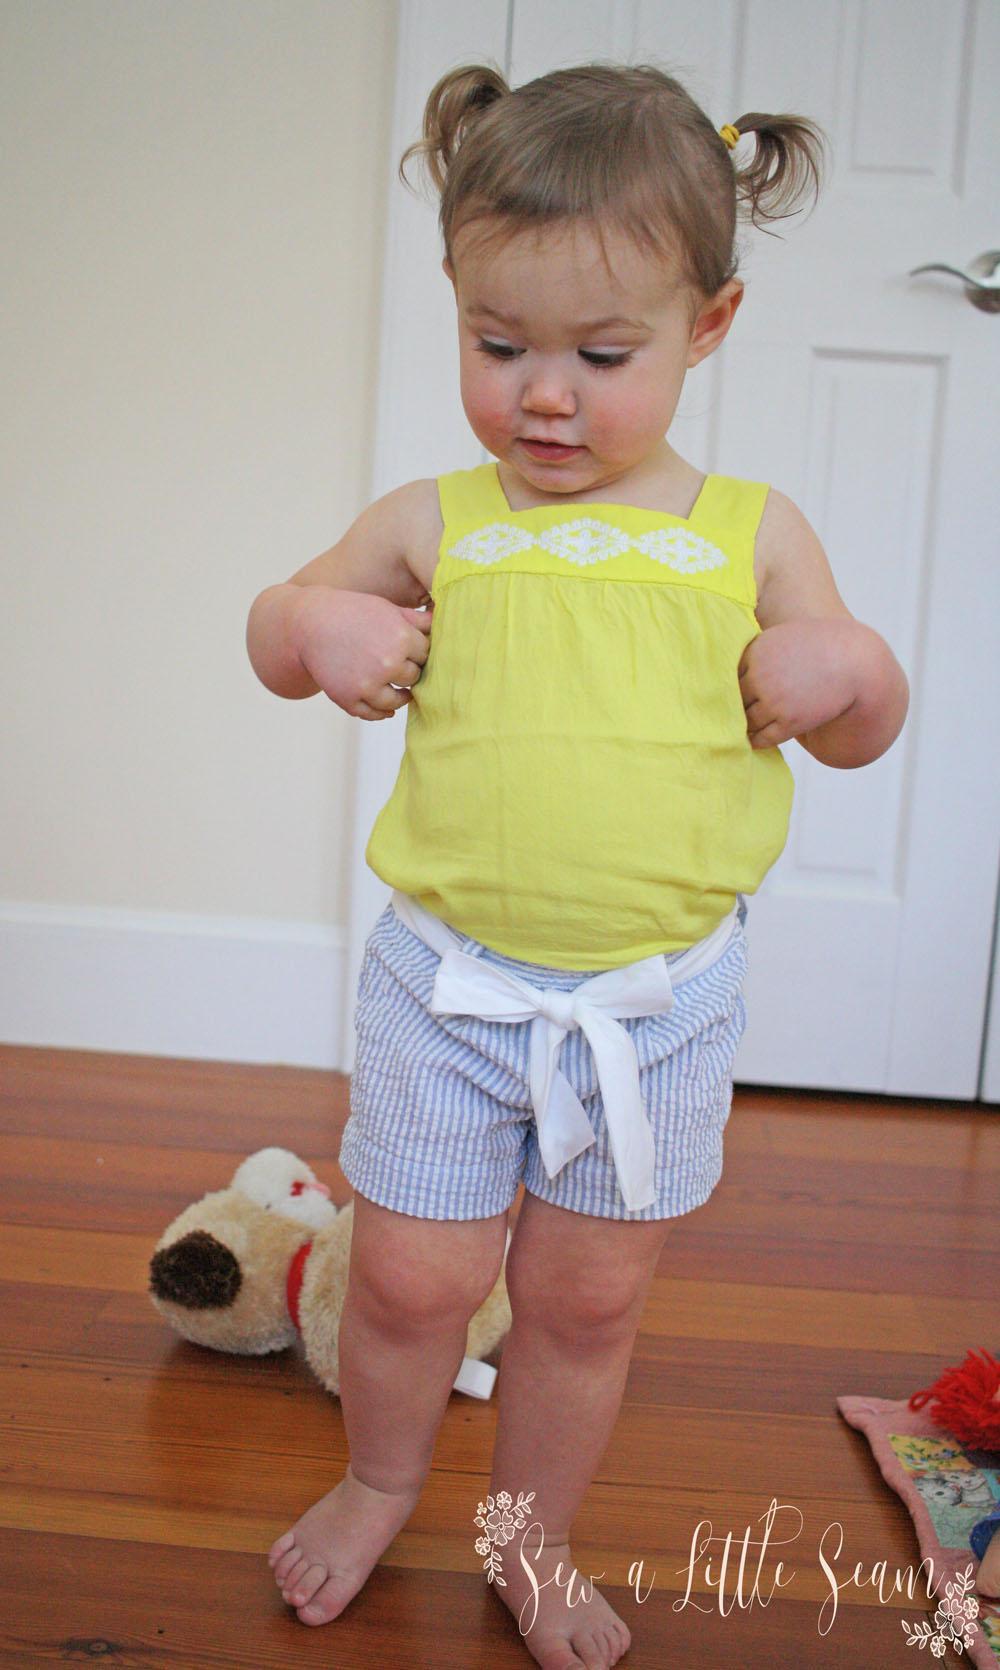 JillyAtlanta Belted Shorts Pattern